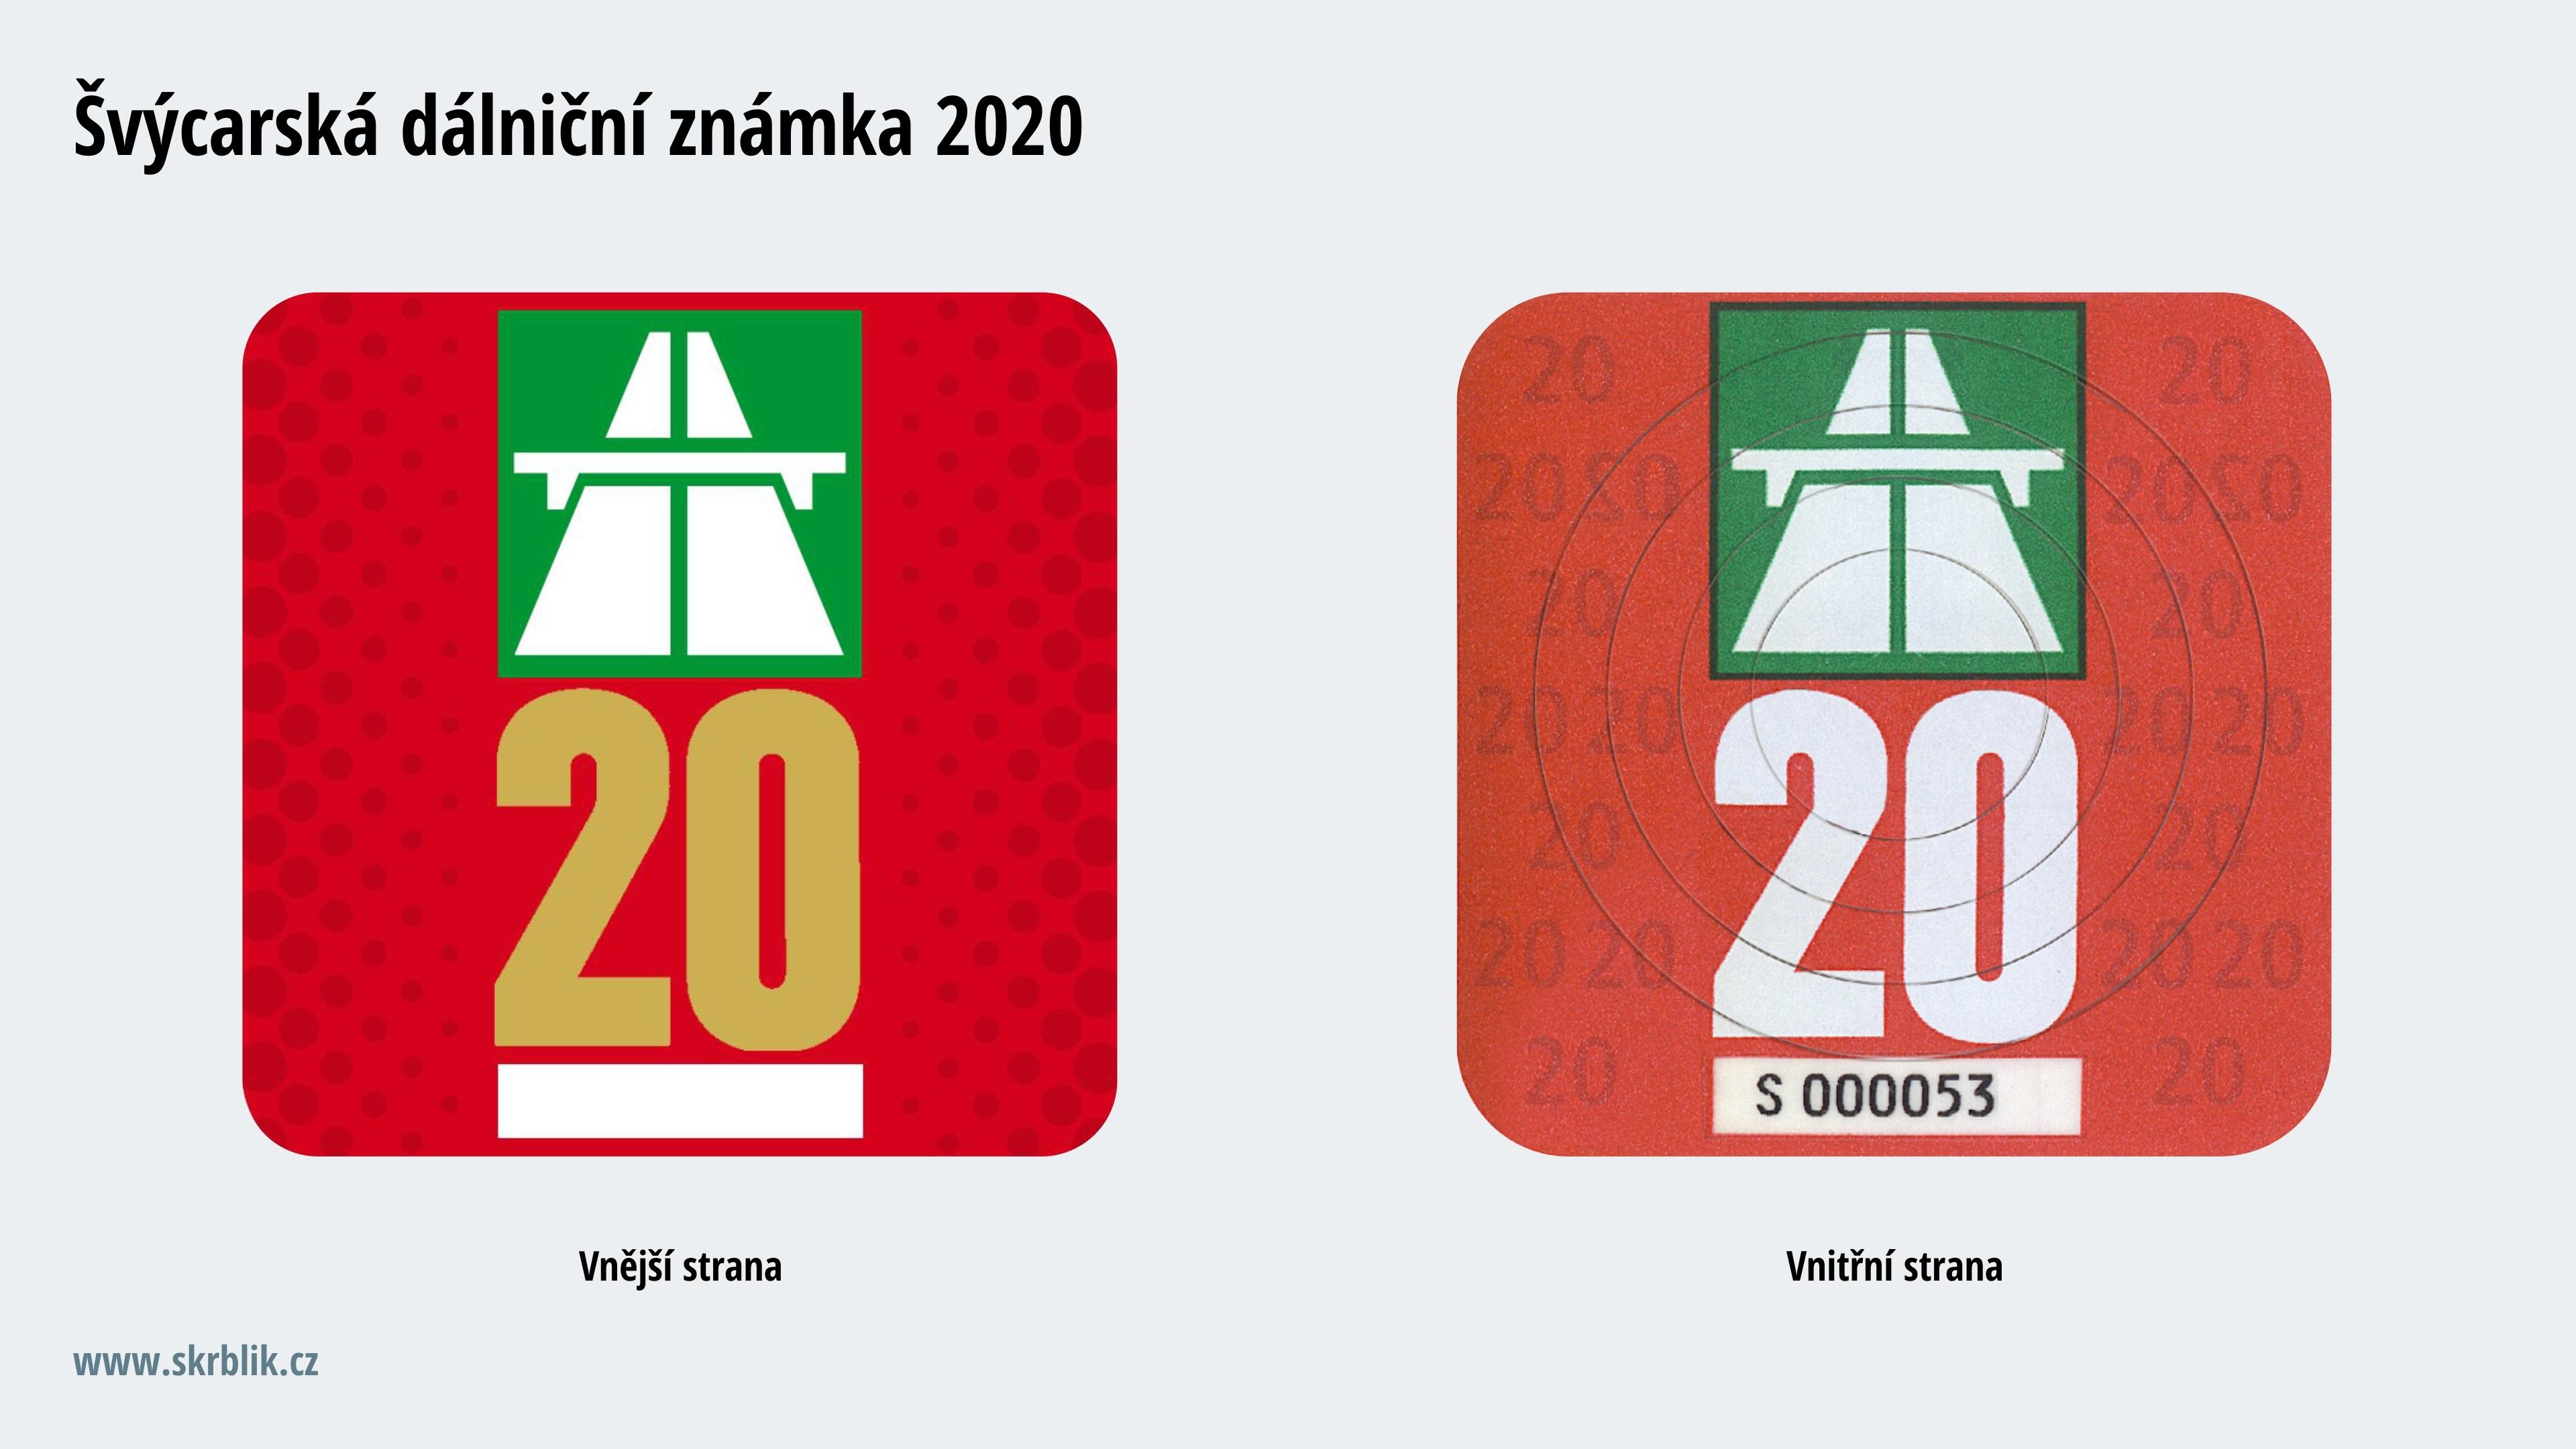 Dalnicni Znamka Svycarsko 2020 Cena Kde Koupit Placene Useky